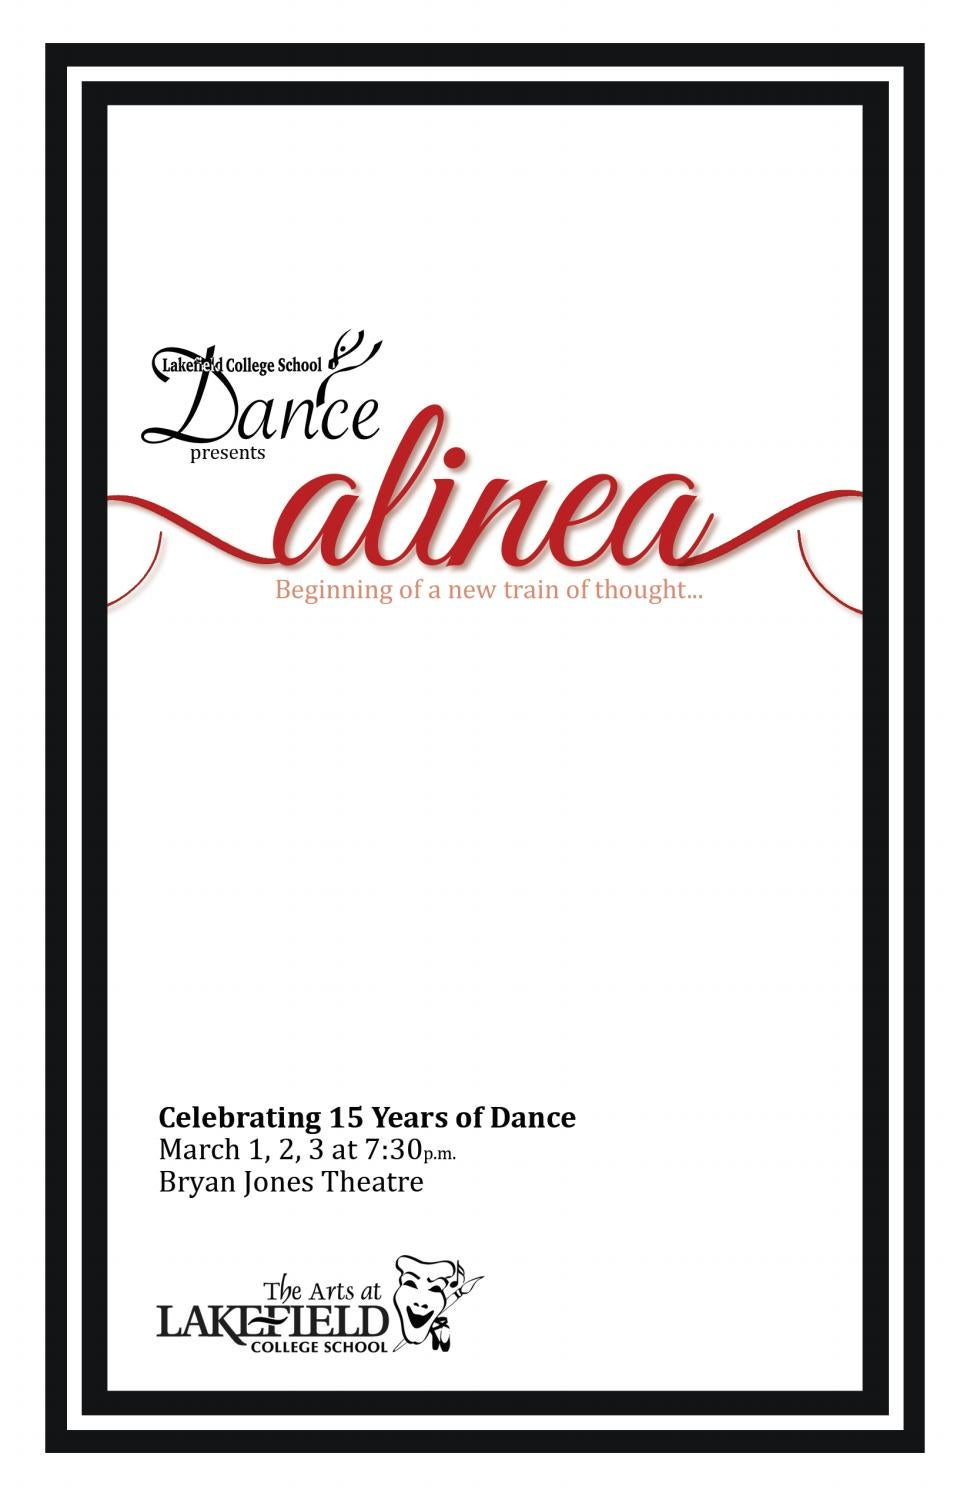 Dance Showcase 2017 - Alinea Program by Lakefield College